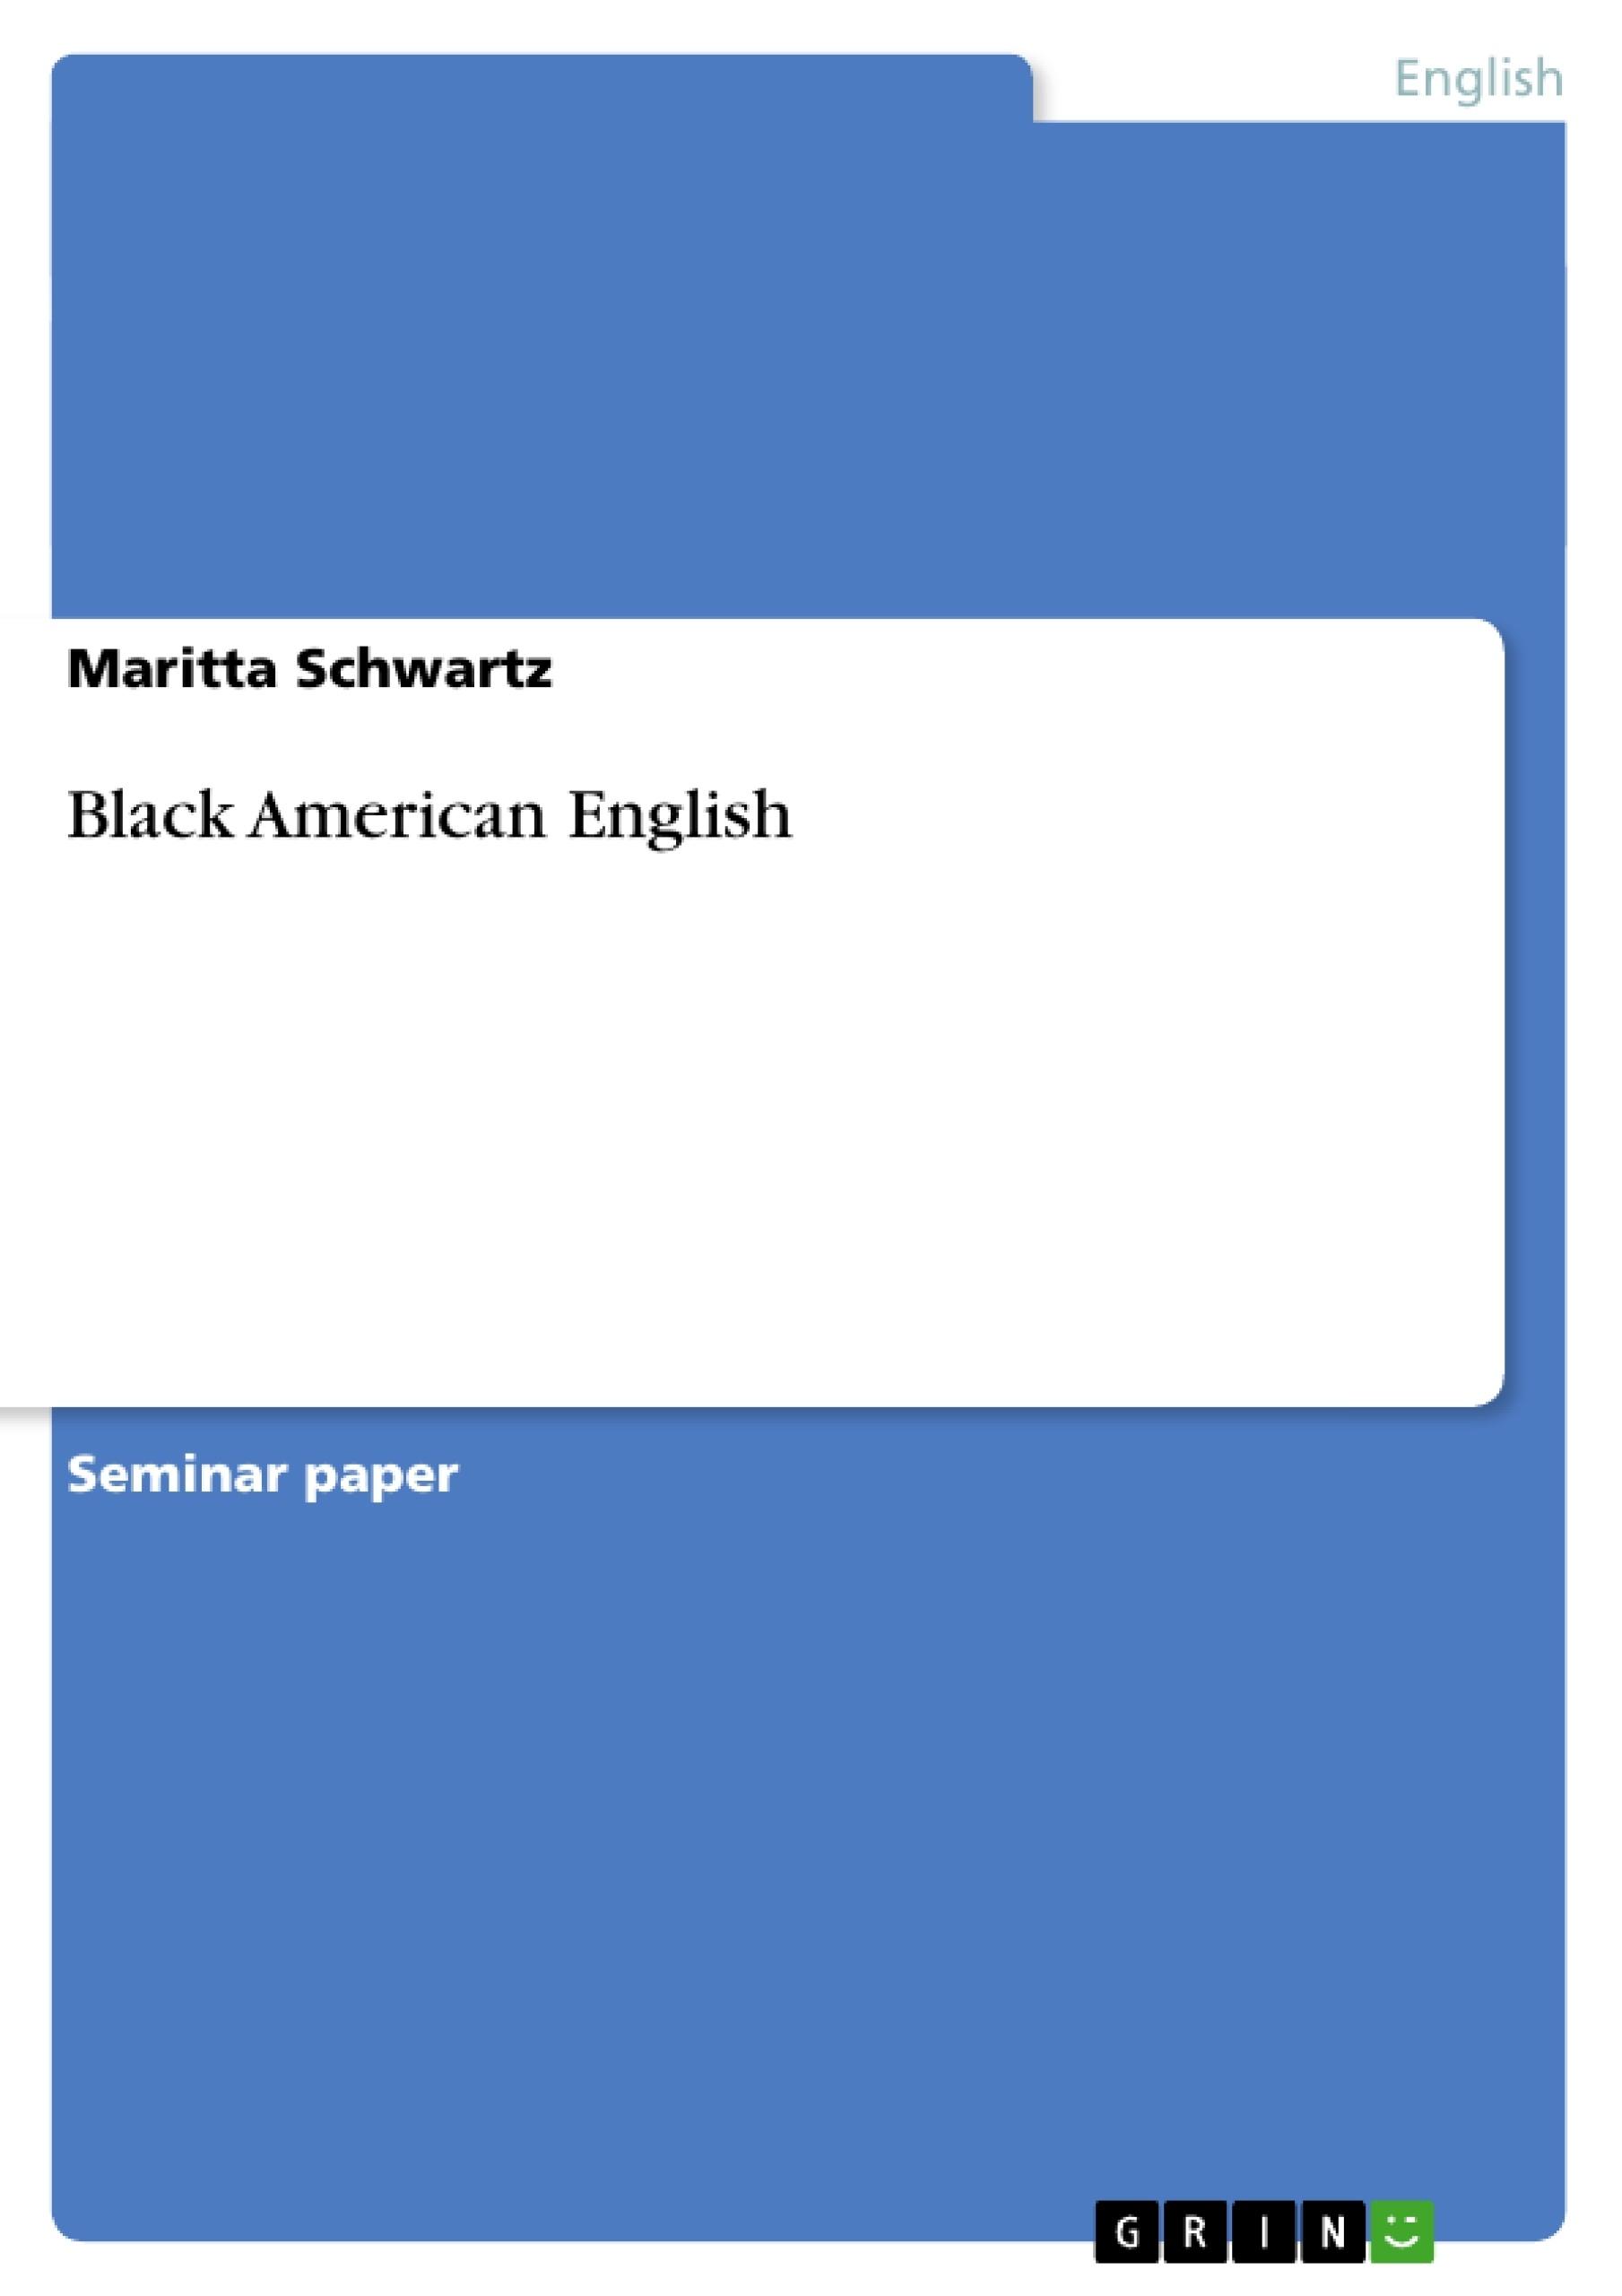 Title: Black American English